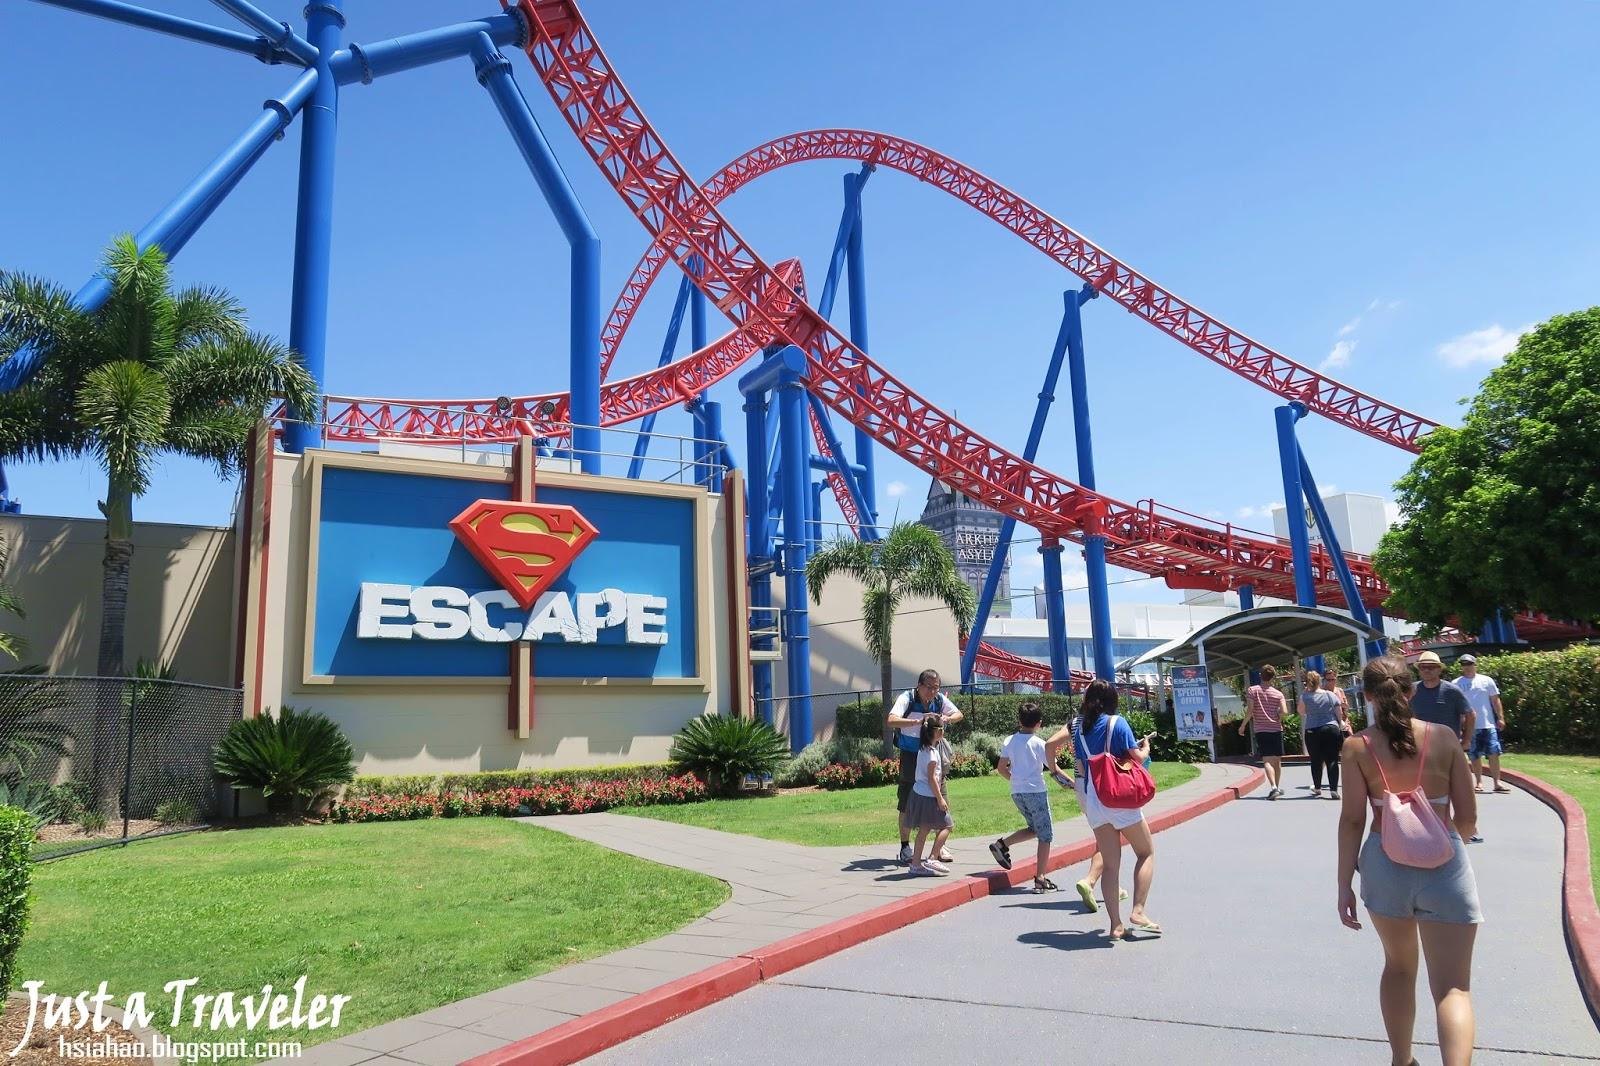 黃金海岸-景點-推薦-電影世界-Gold-Coast-Attraction-Movie-World-Tourist-destination